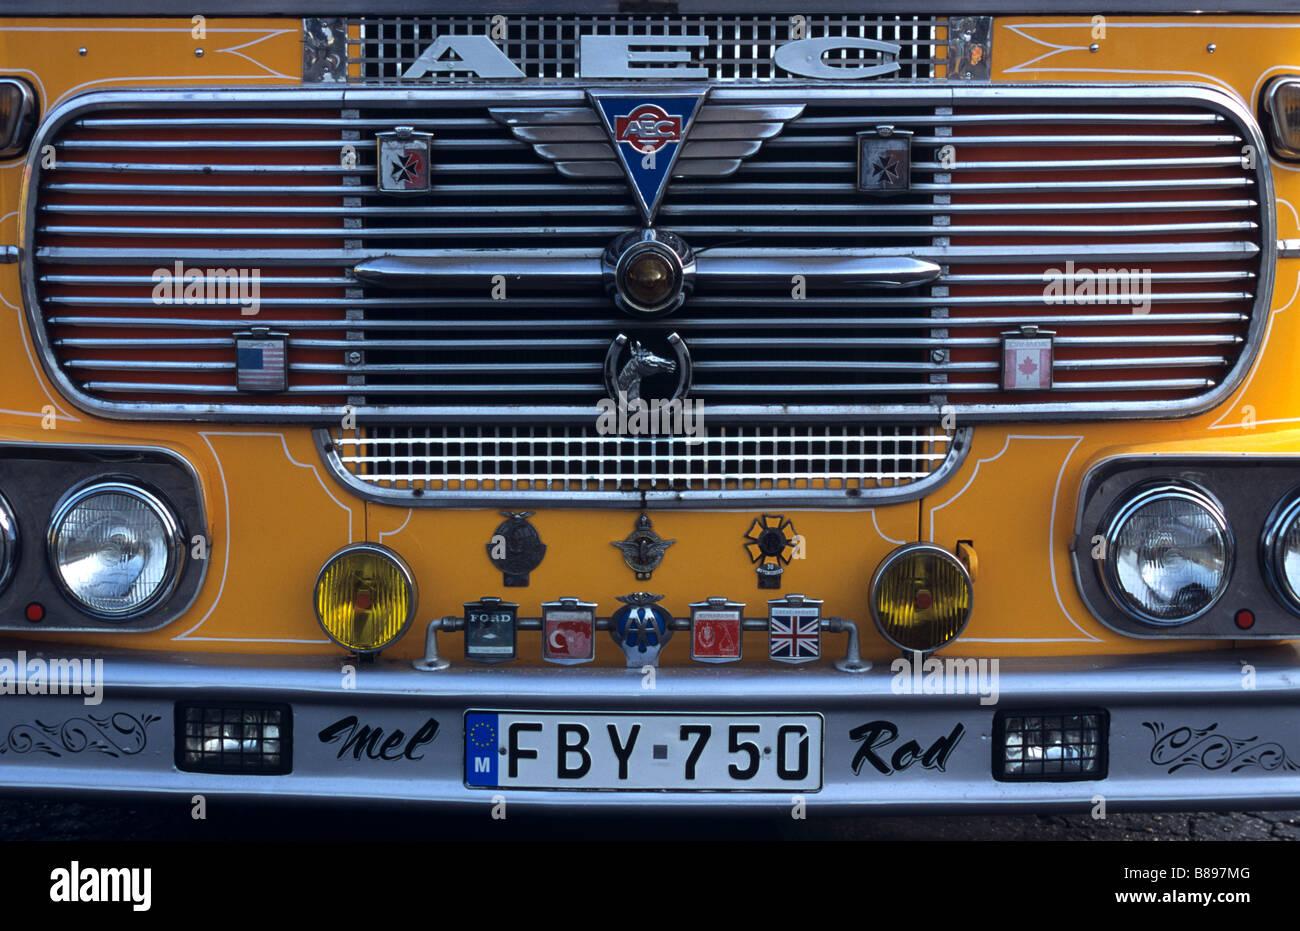 Chrome Radiator Grill of 1960s AEC Bus, Maltese Bus, Valletta, Malta - Stock Image